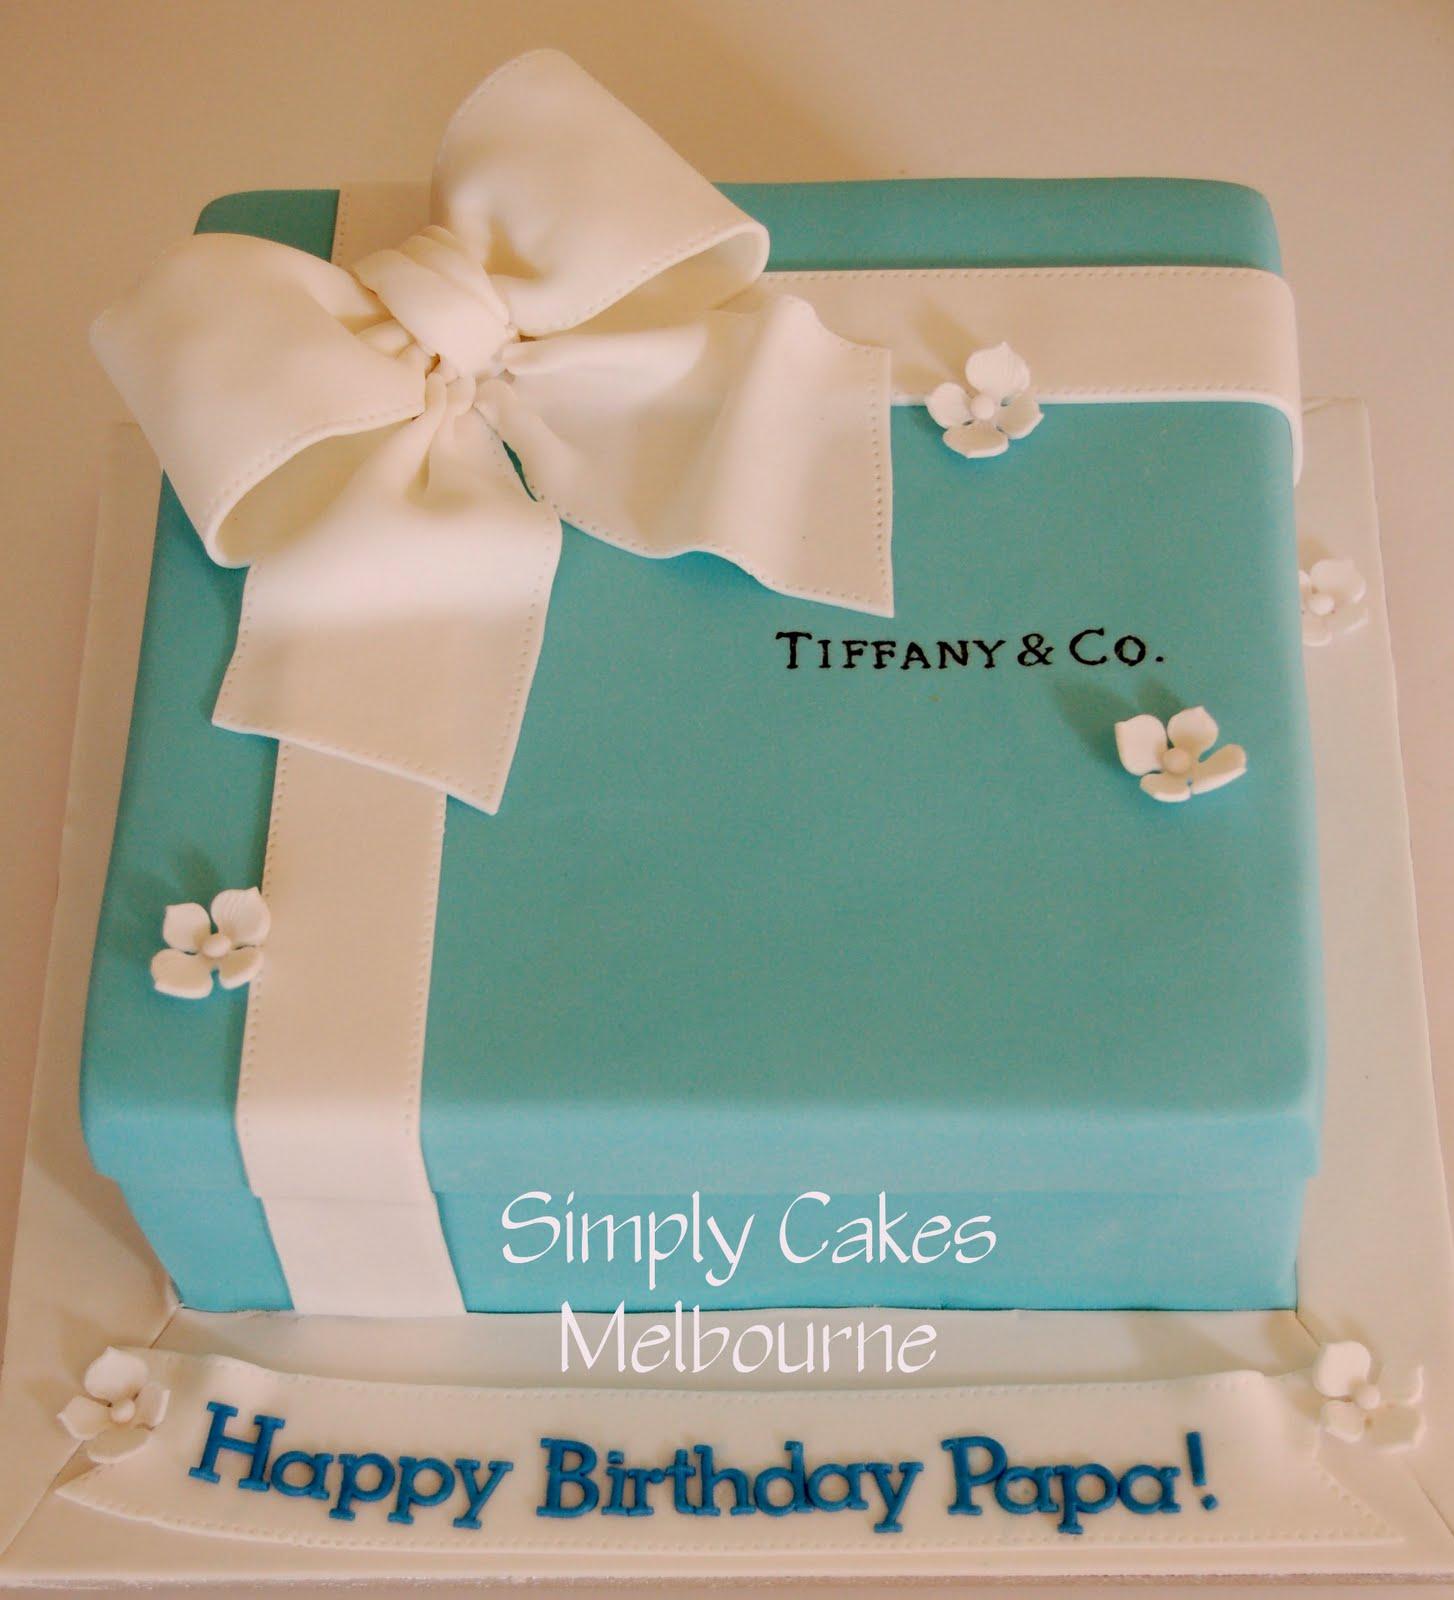 Simply Cakes Melbourne Tiffany box birthday cake